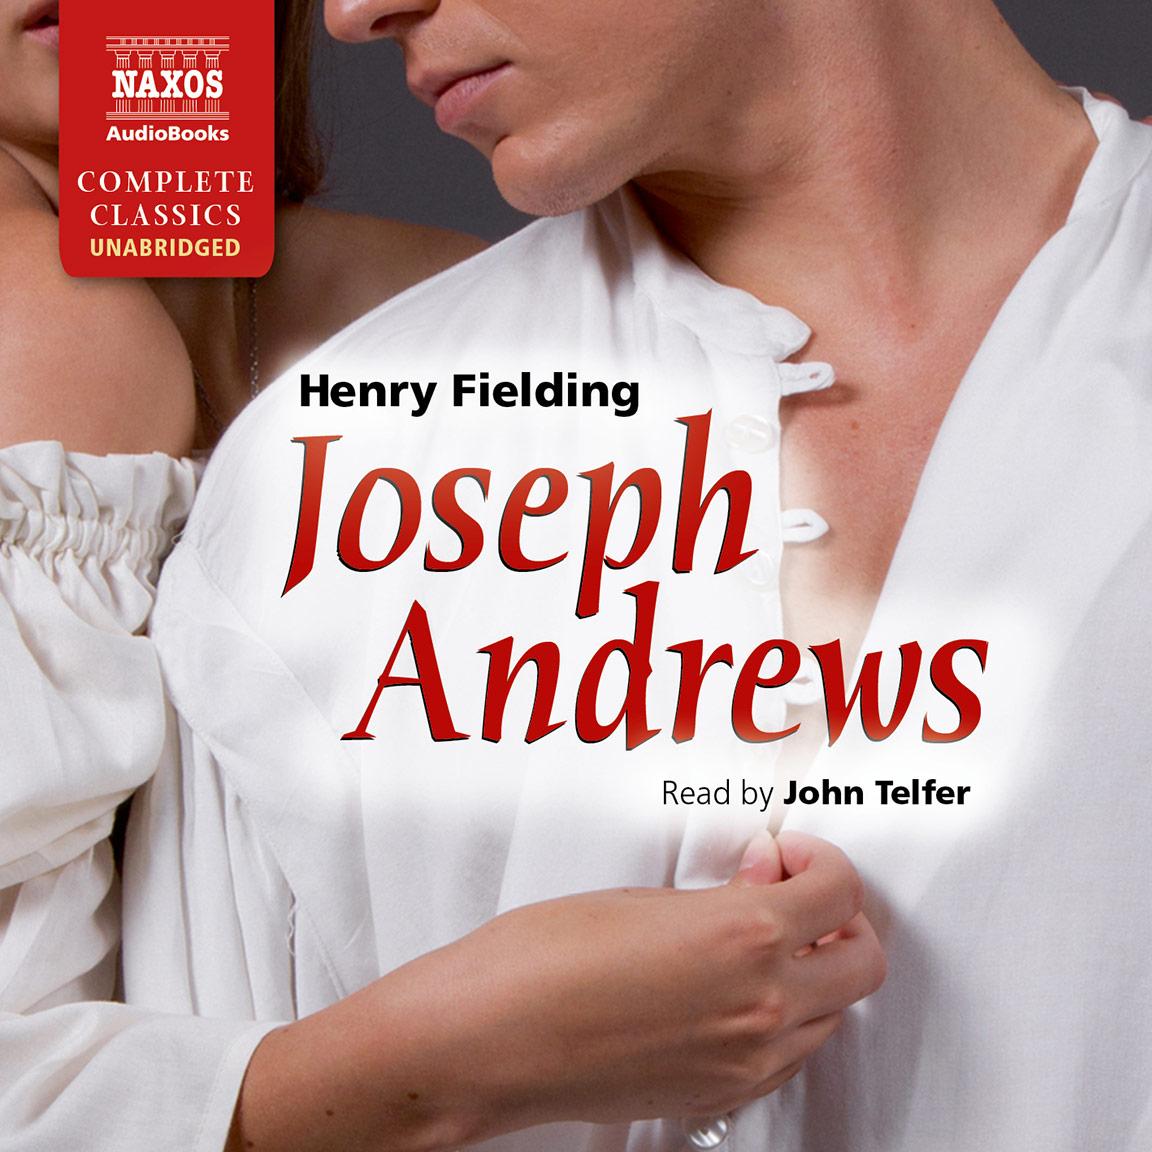 Joseph Andrews (unabridged)